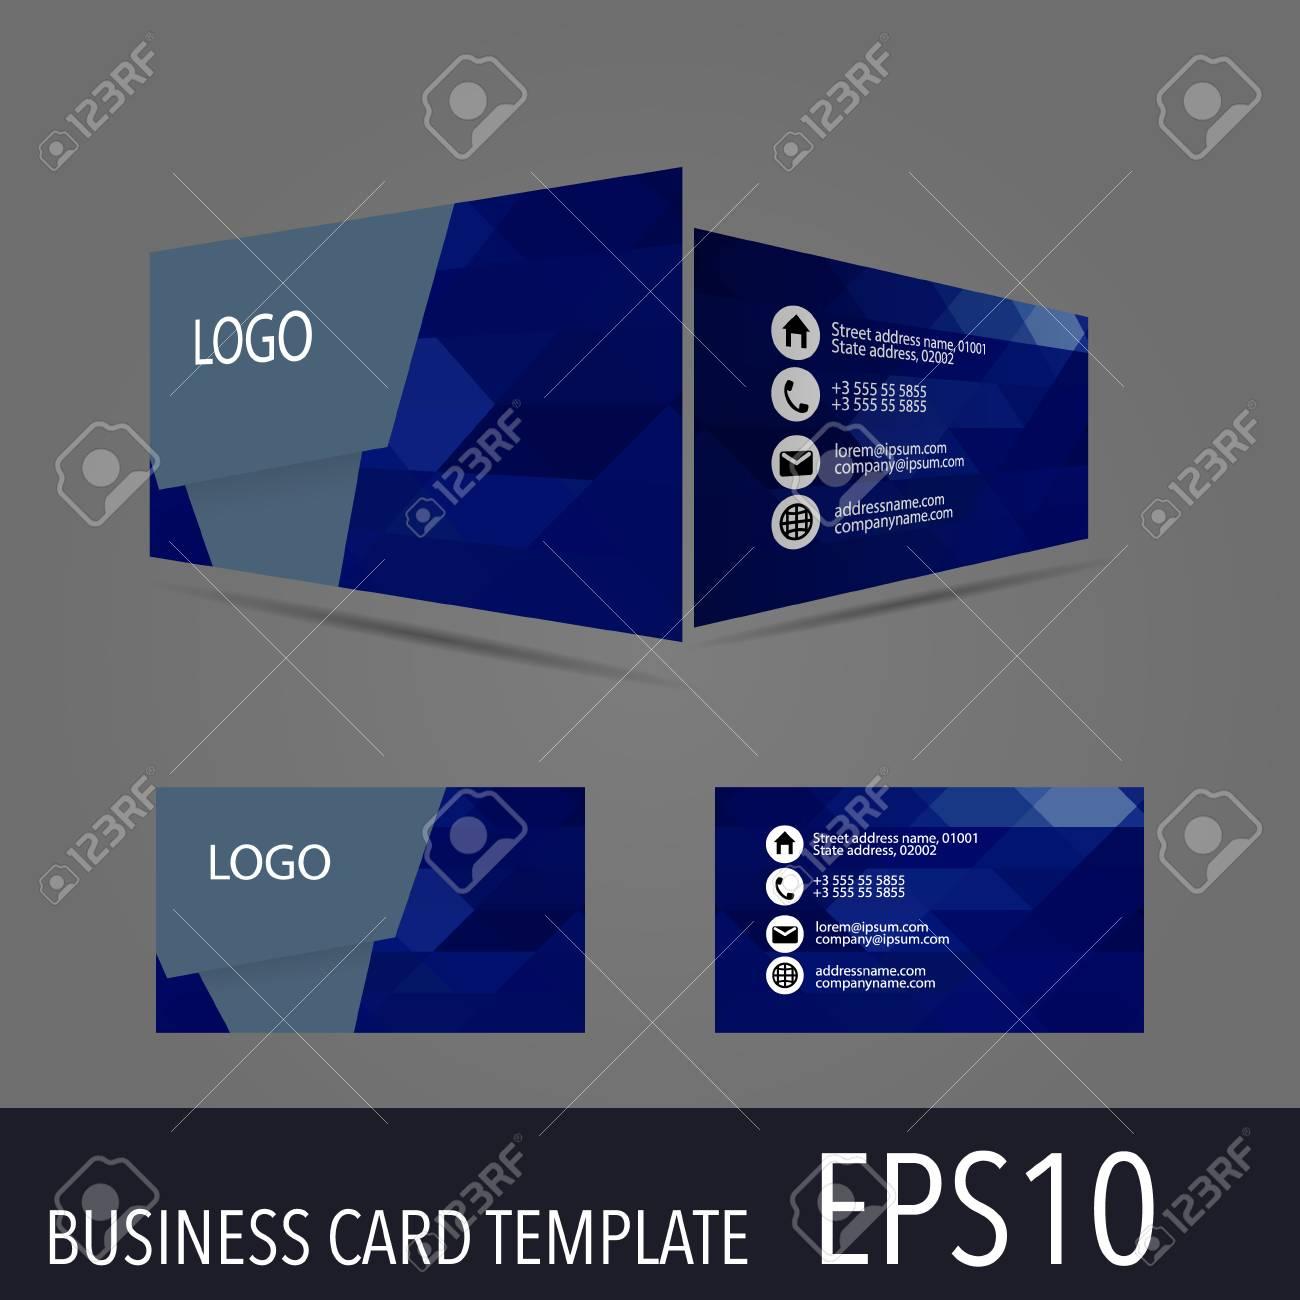 3d vector business card template modern simple luxury standard